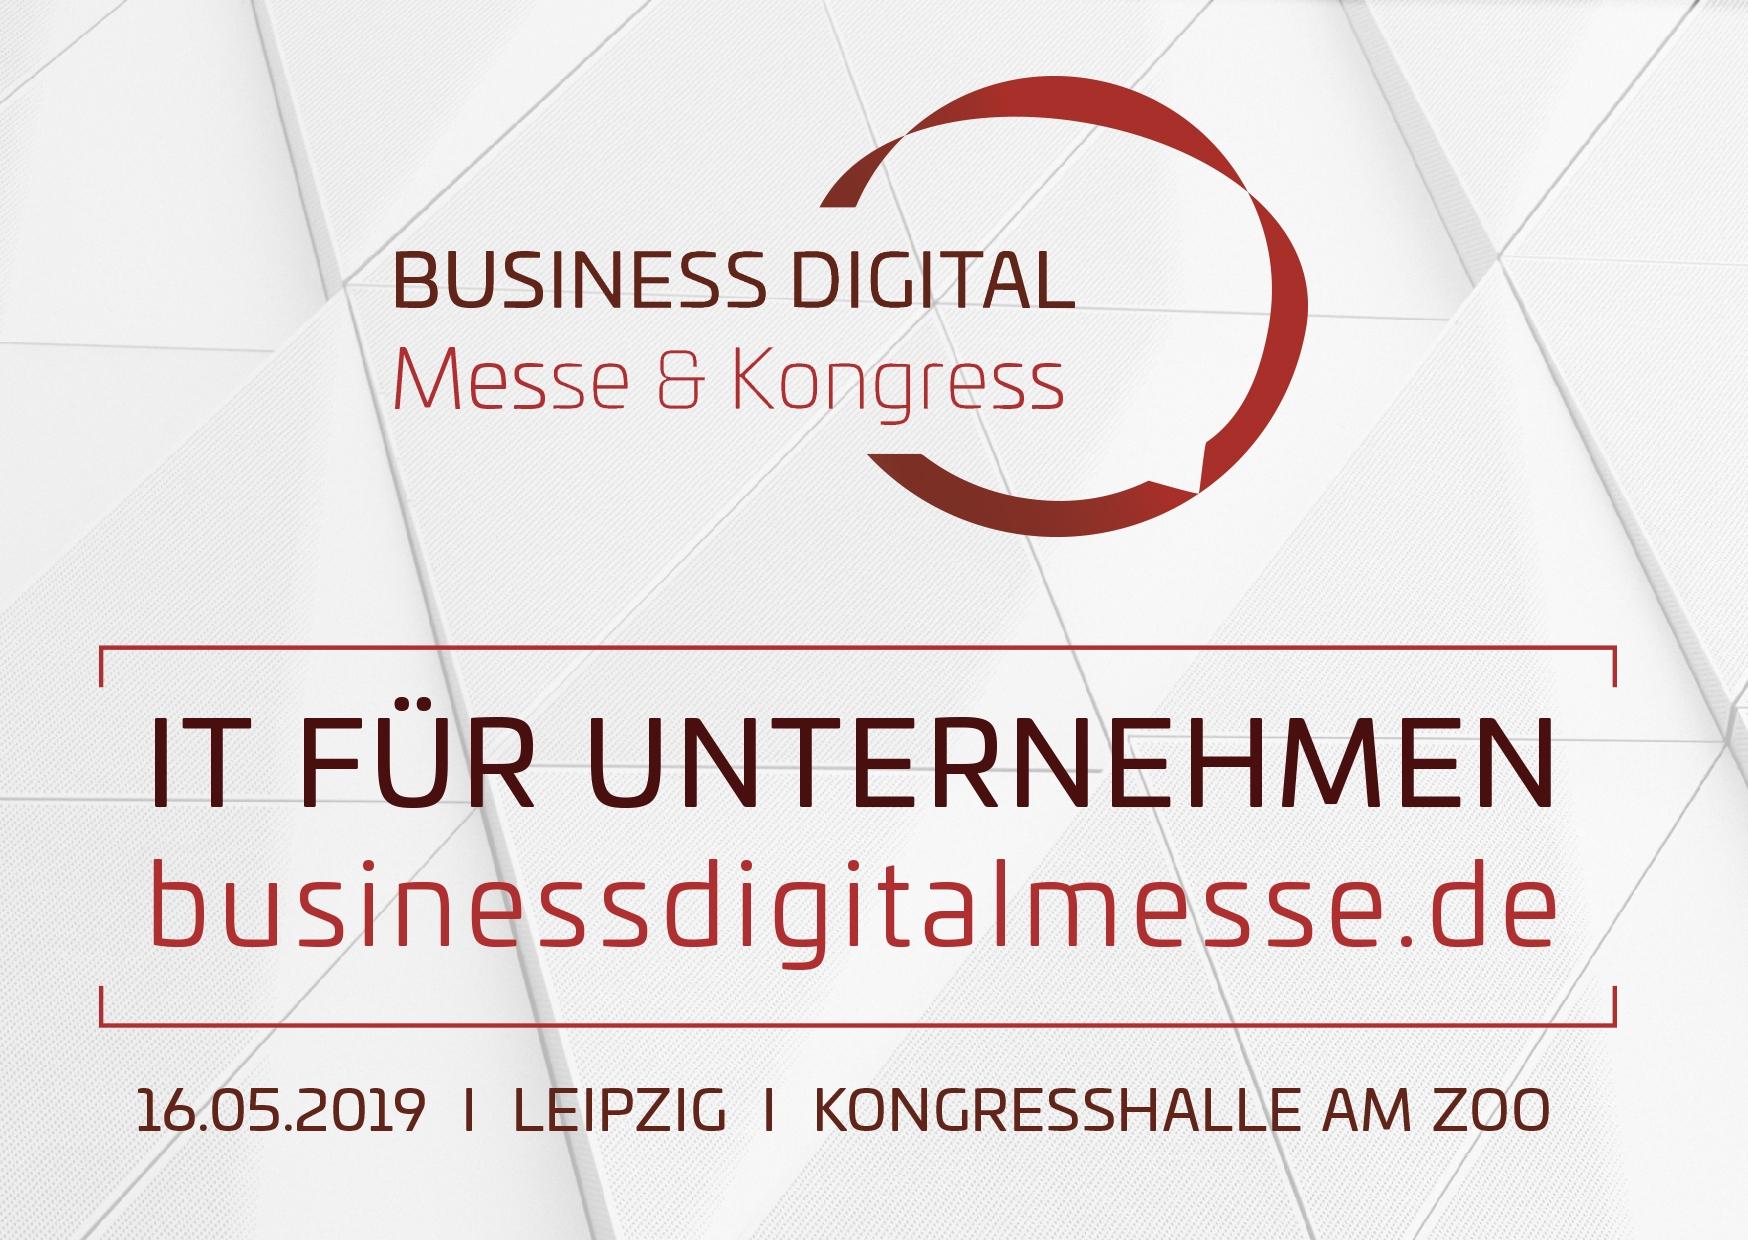 Fachmesse Digitalisierung Business Digital 2019